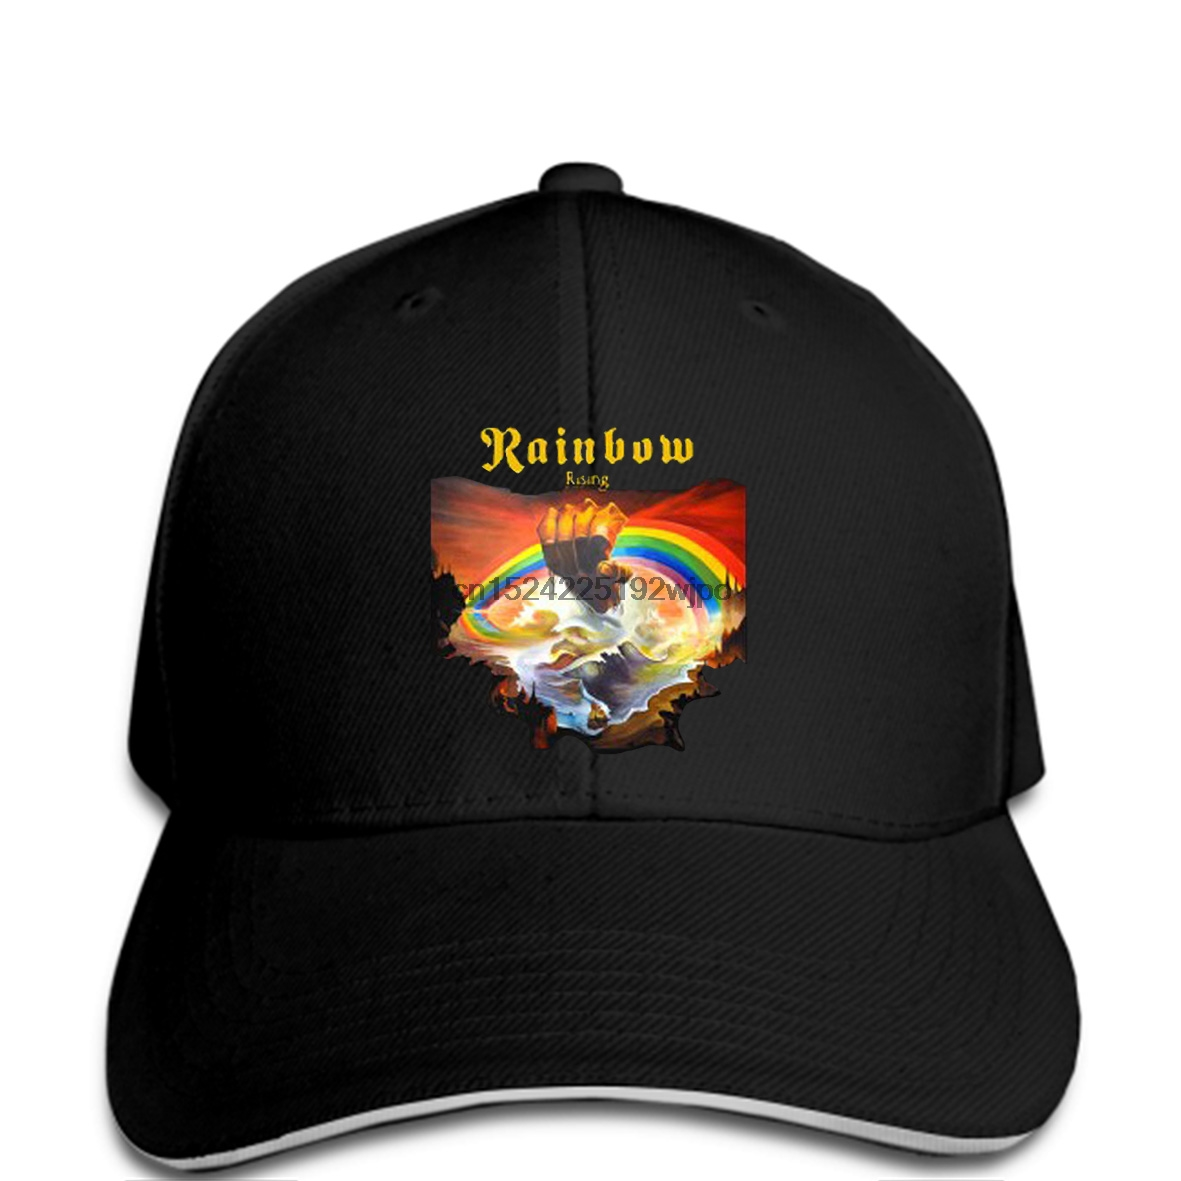 NEW /& OFFICIAL! Rainbow /'Rising/' Baseball Cap